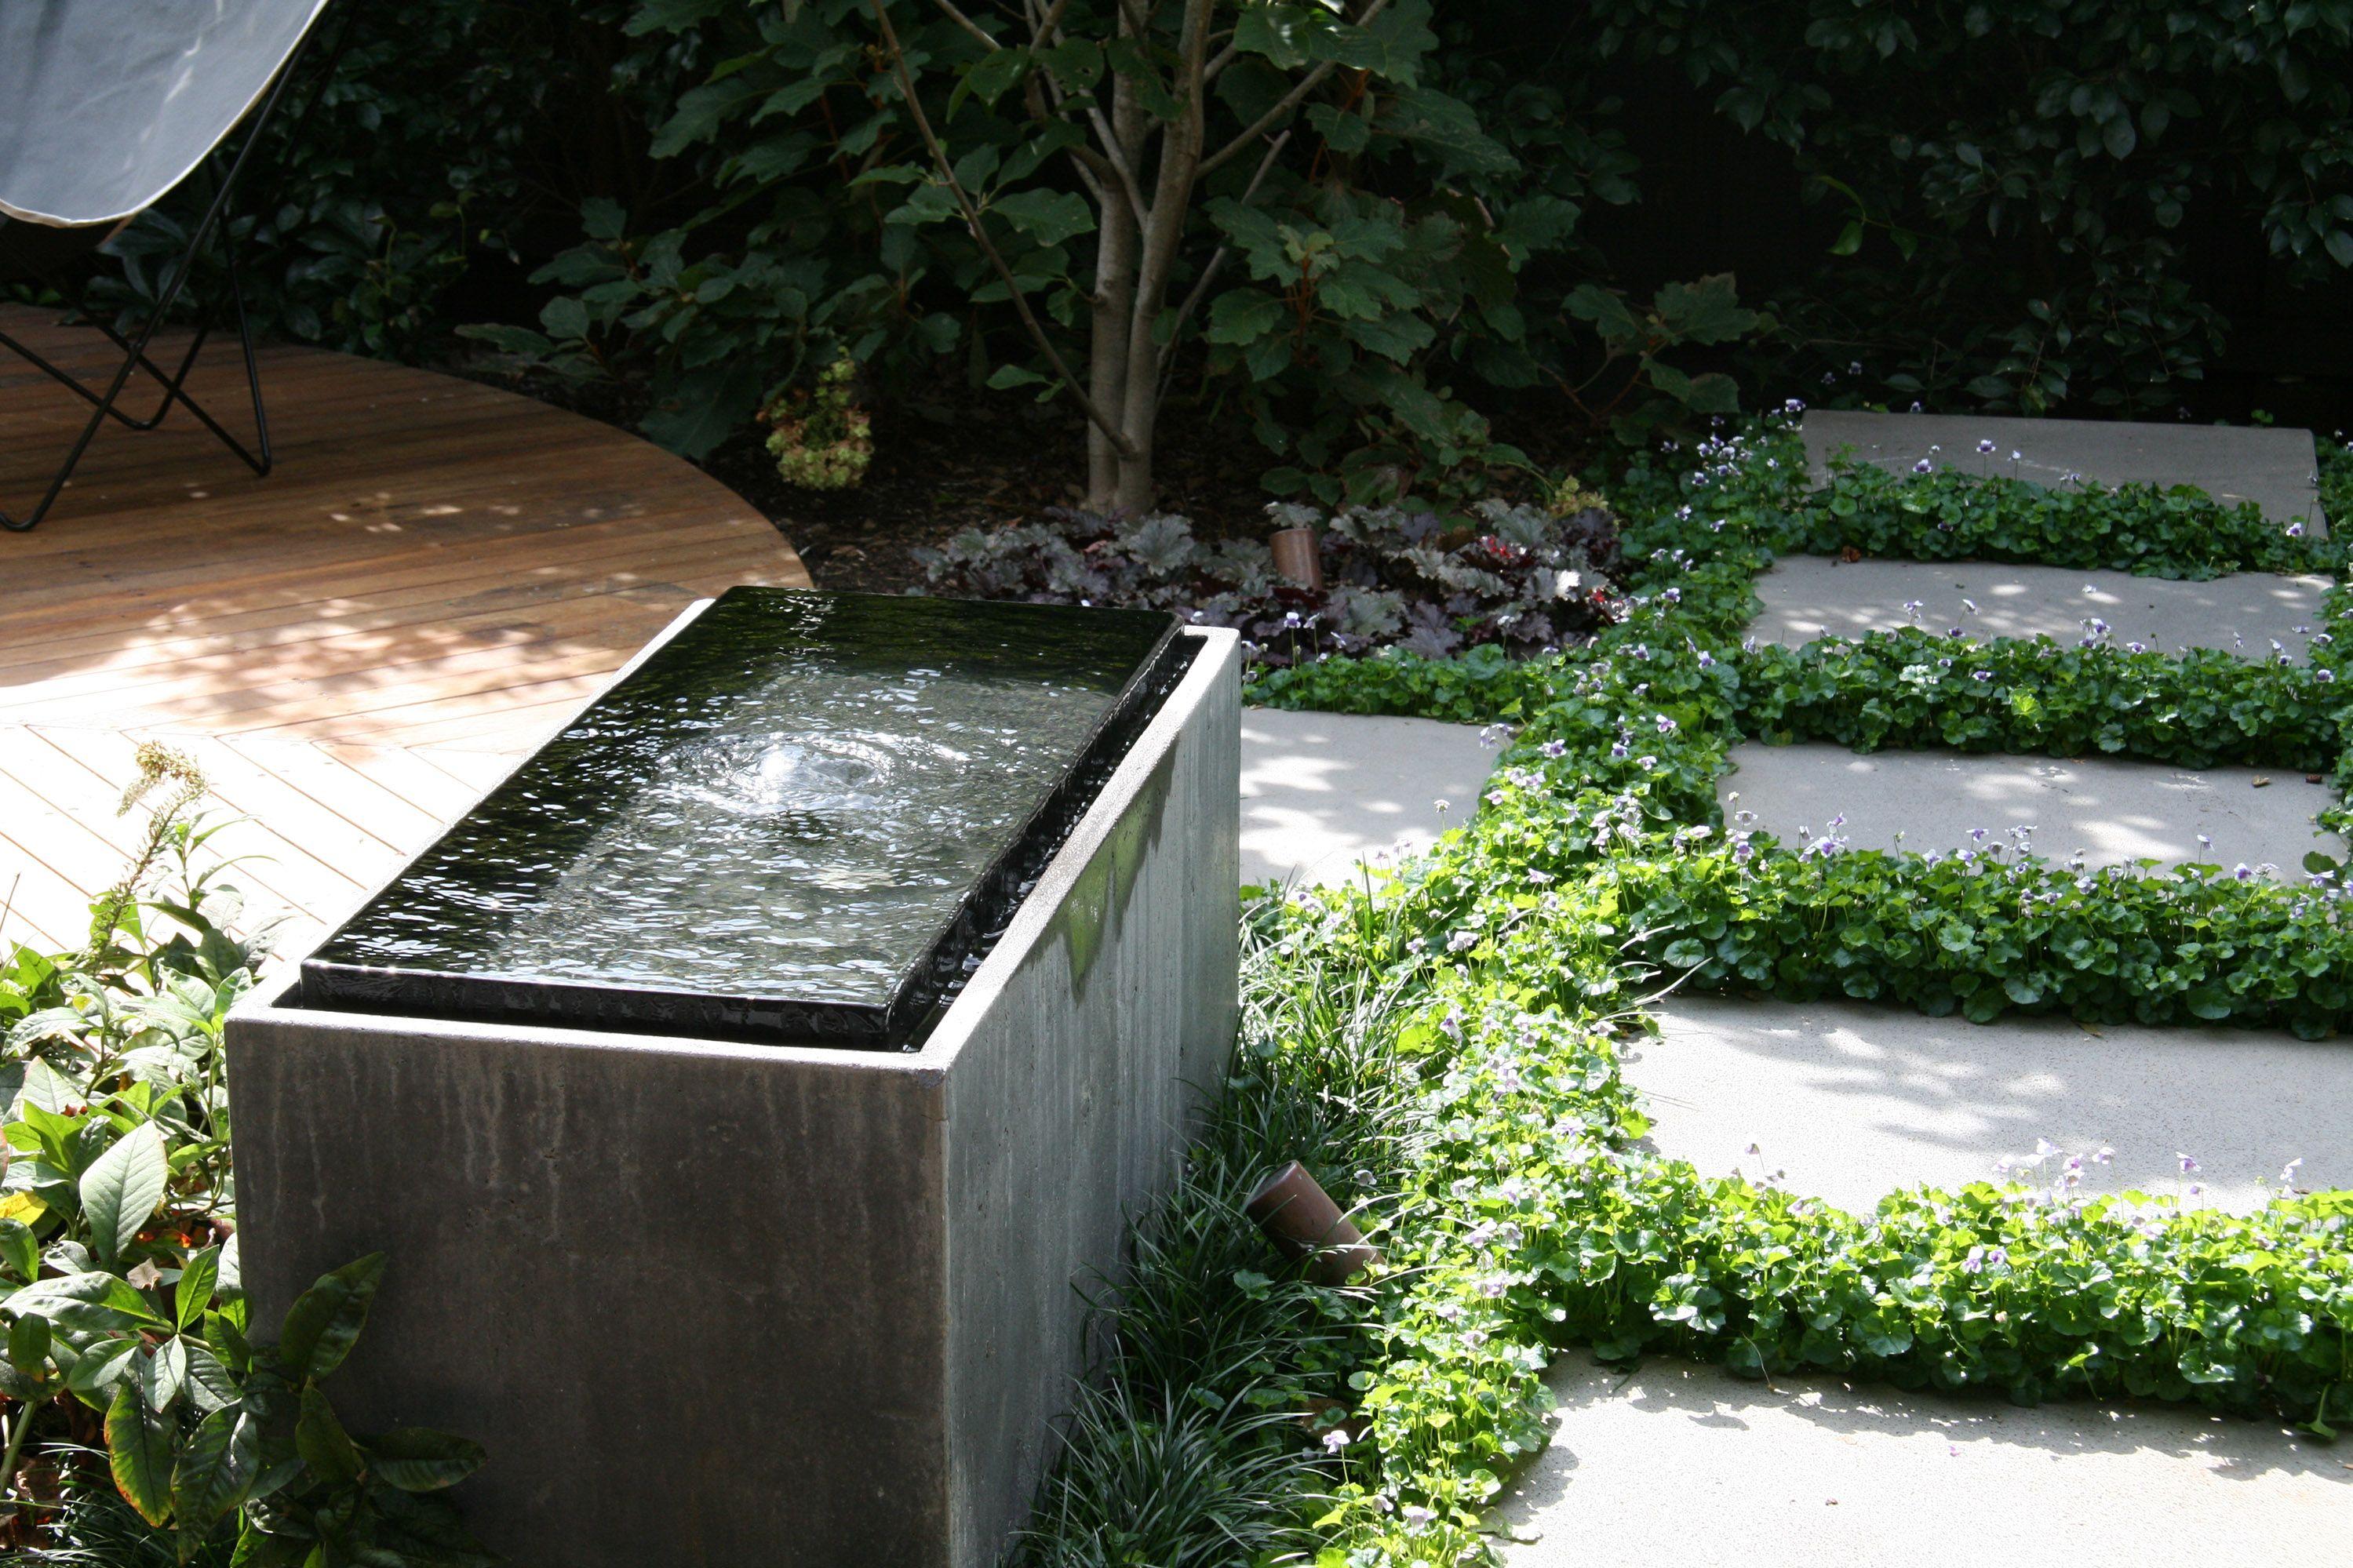 Garden Design Maitland St Outdoor Gardens Water Features In The Garden Garden Design